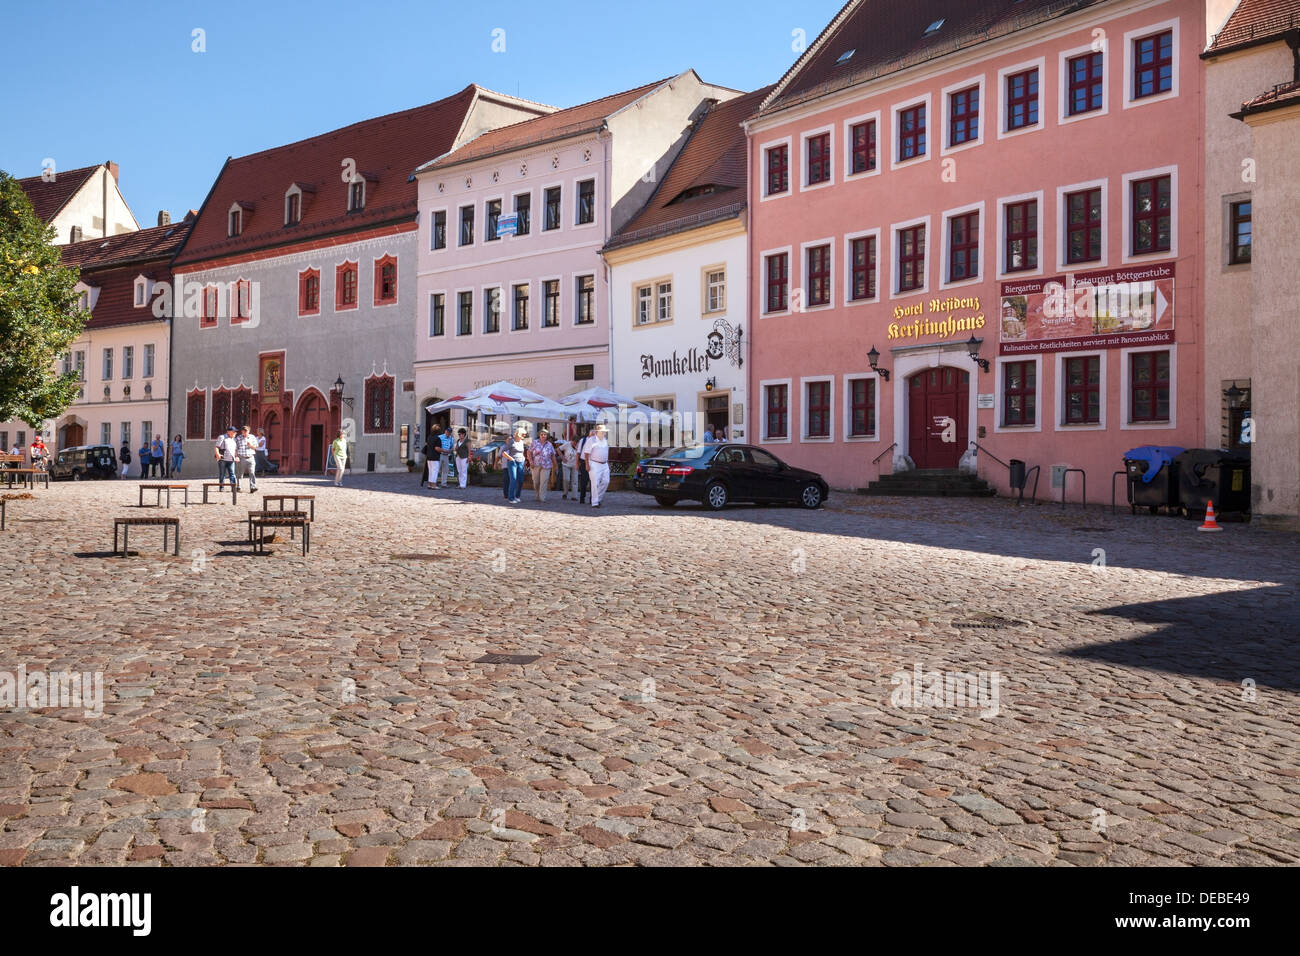 Domplatz, Altstadt, Meissen, Sachsen, Deutschland Stockbild